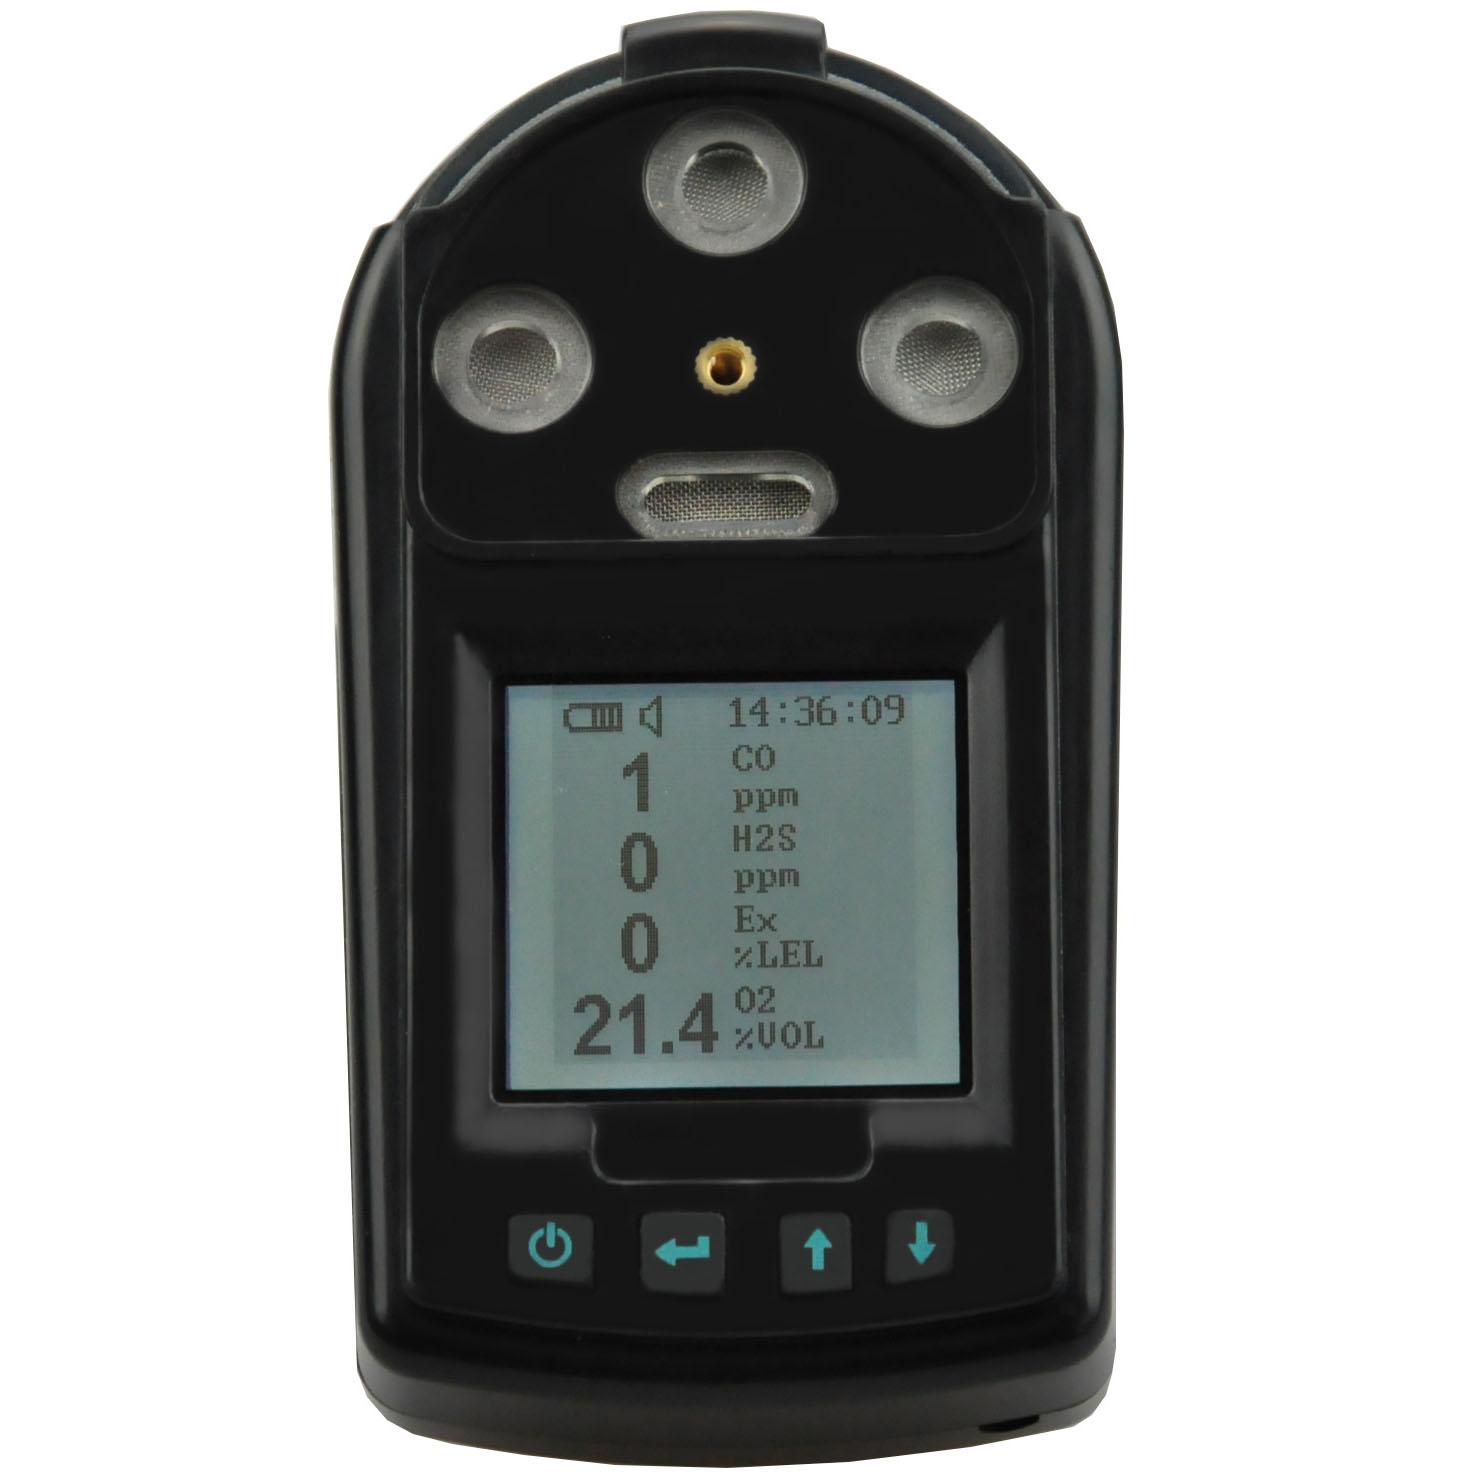 Portable multi gas detector oc-904